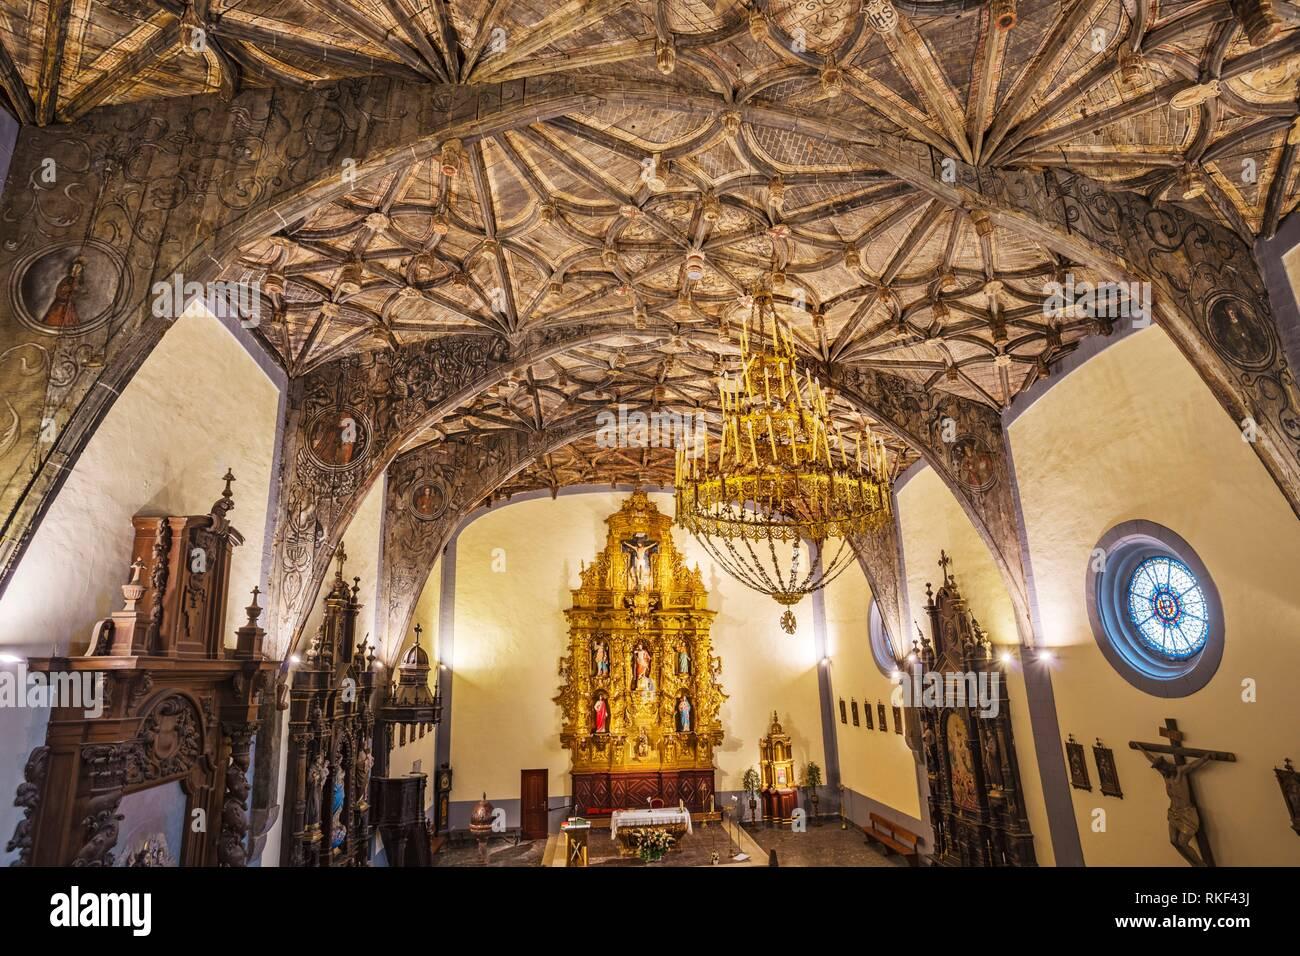 Wood Vault, 16th century. San Andres Church. Ibarrangelu. Urdaibai Region. Bizkaia. Basque Country. Spain. - Stock Image